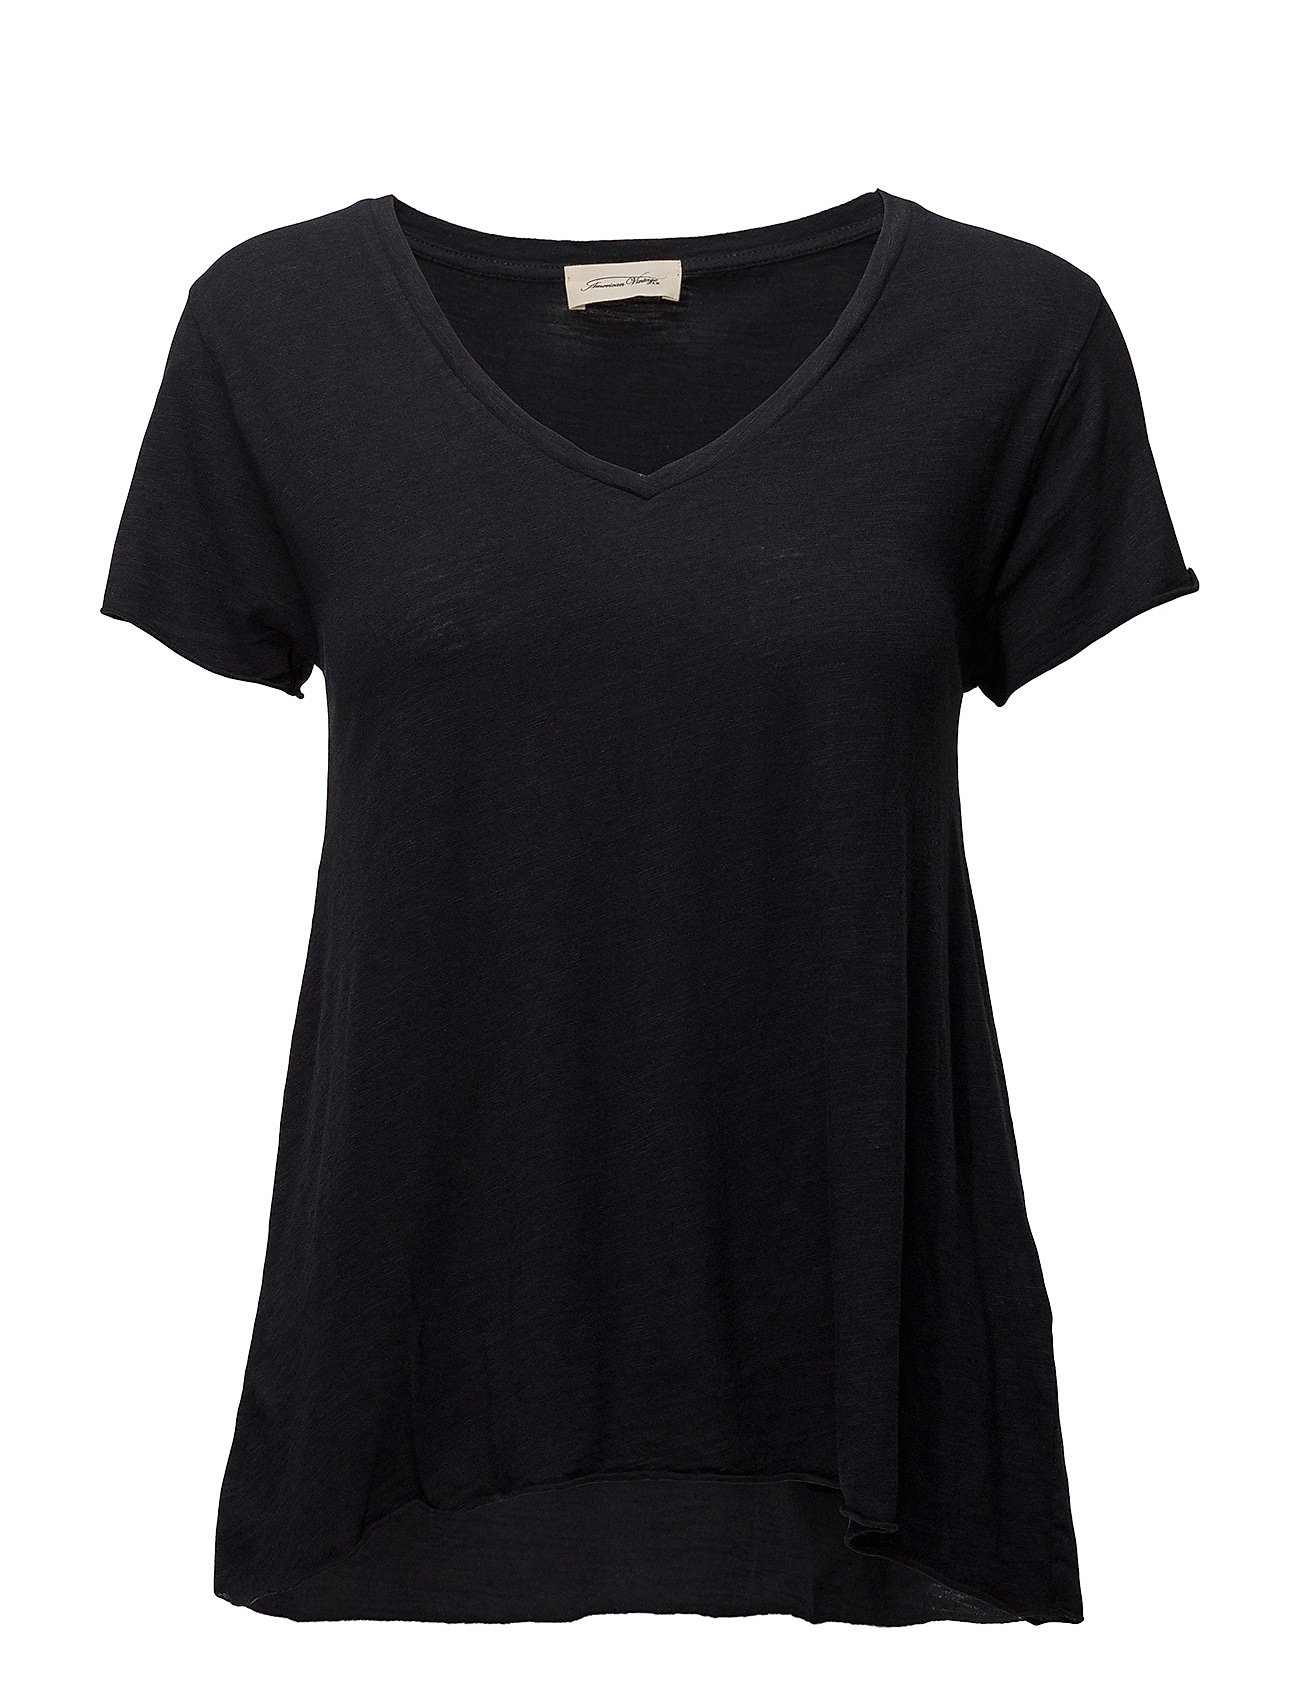 Jacksonville T-shirt Top Sort American Vintage